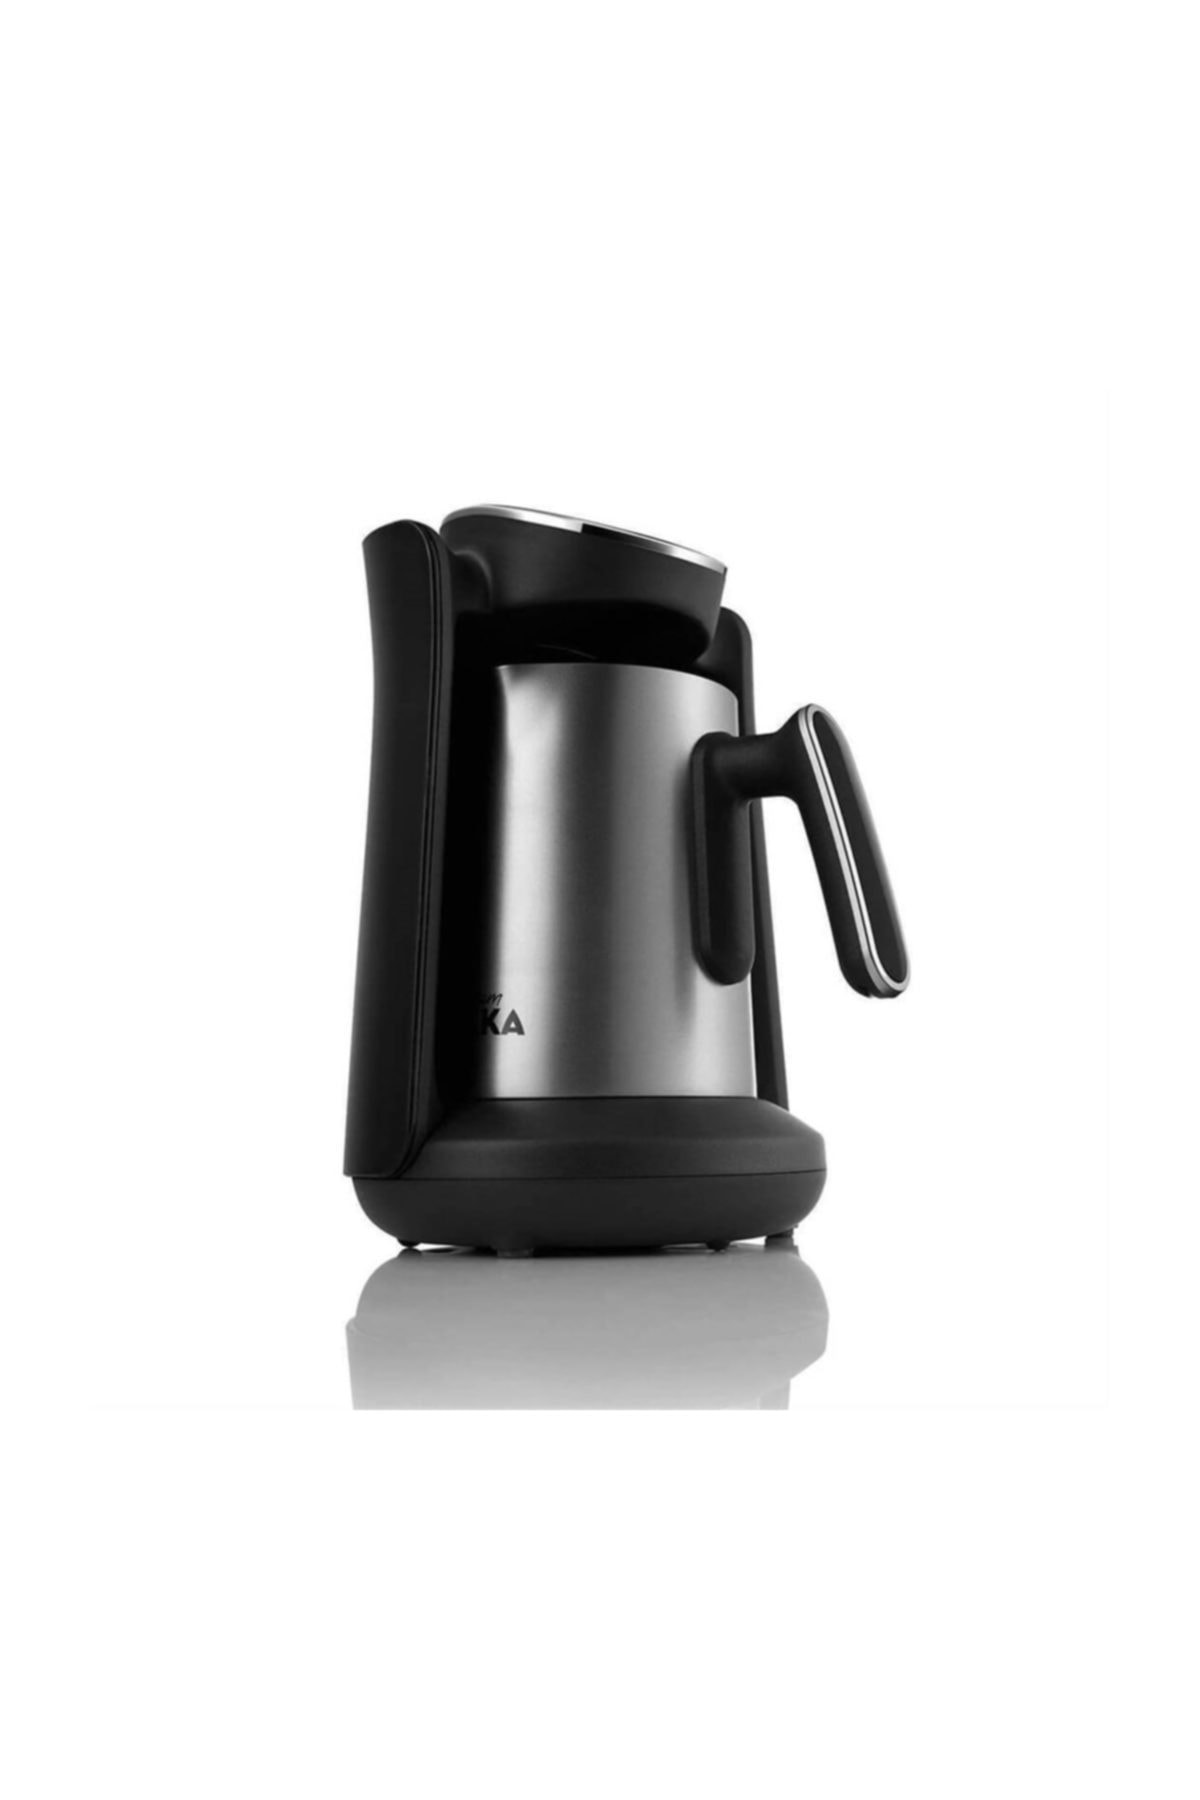 Arzum OK0010-K OKKA Minio Pro Türk Kahvesi Makinesi - Krom 2